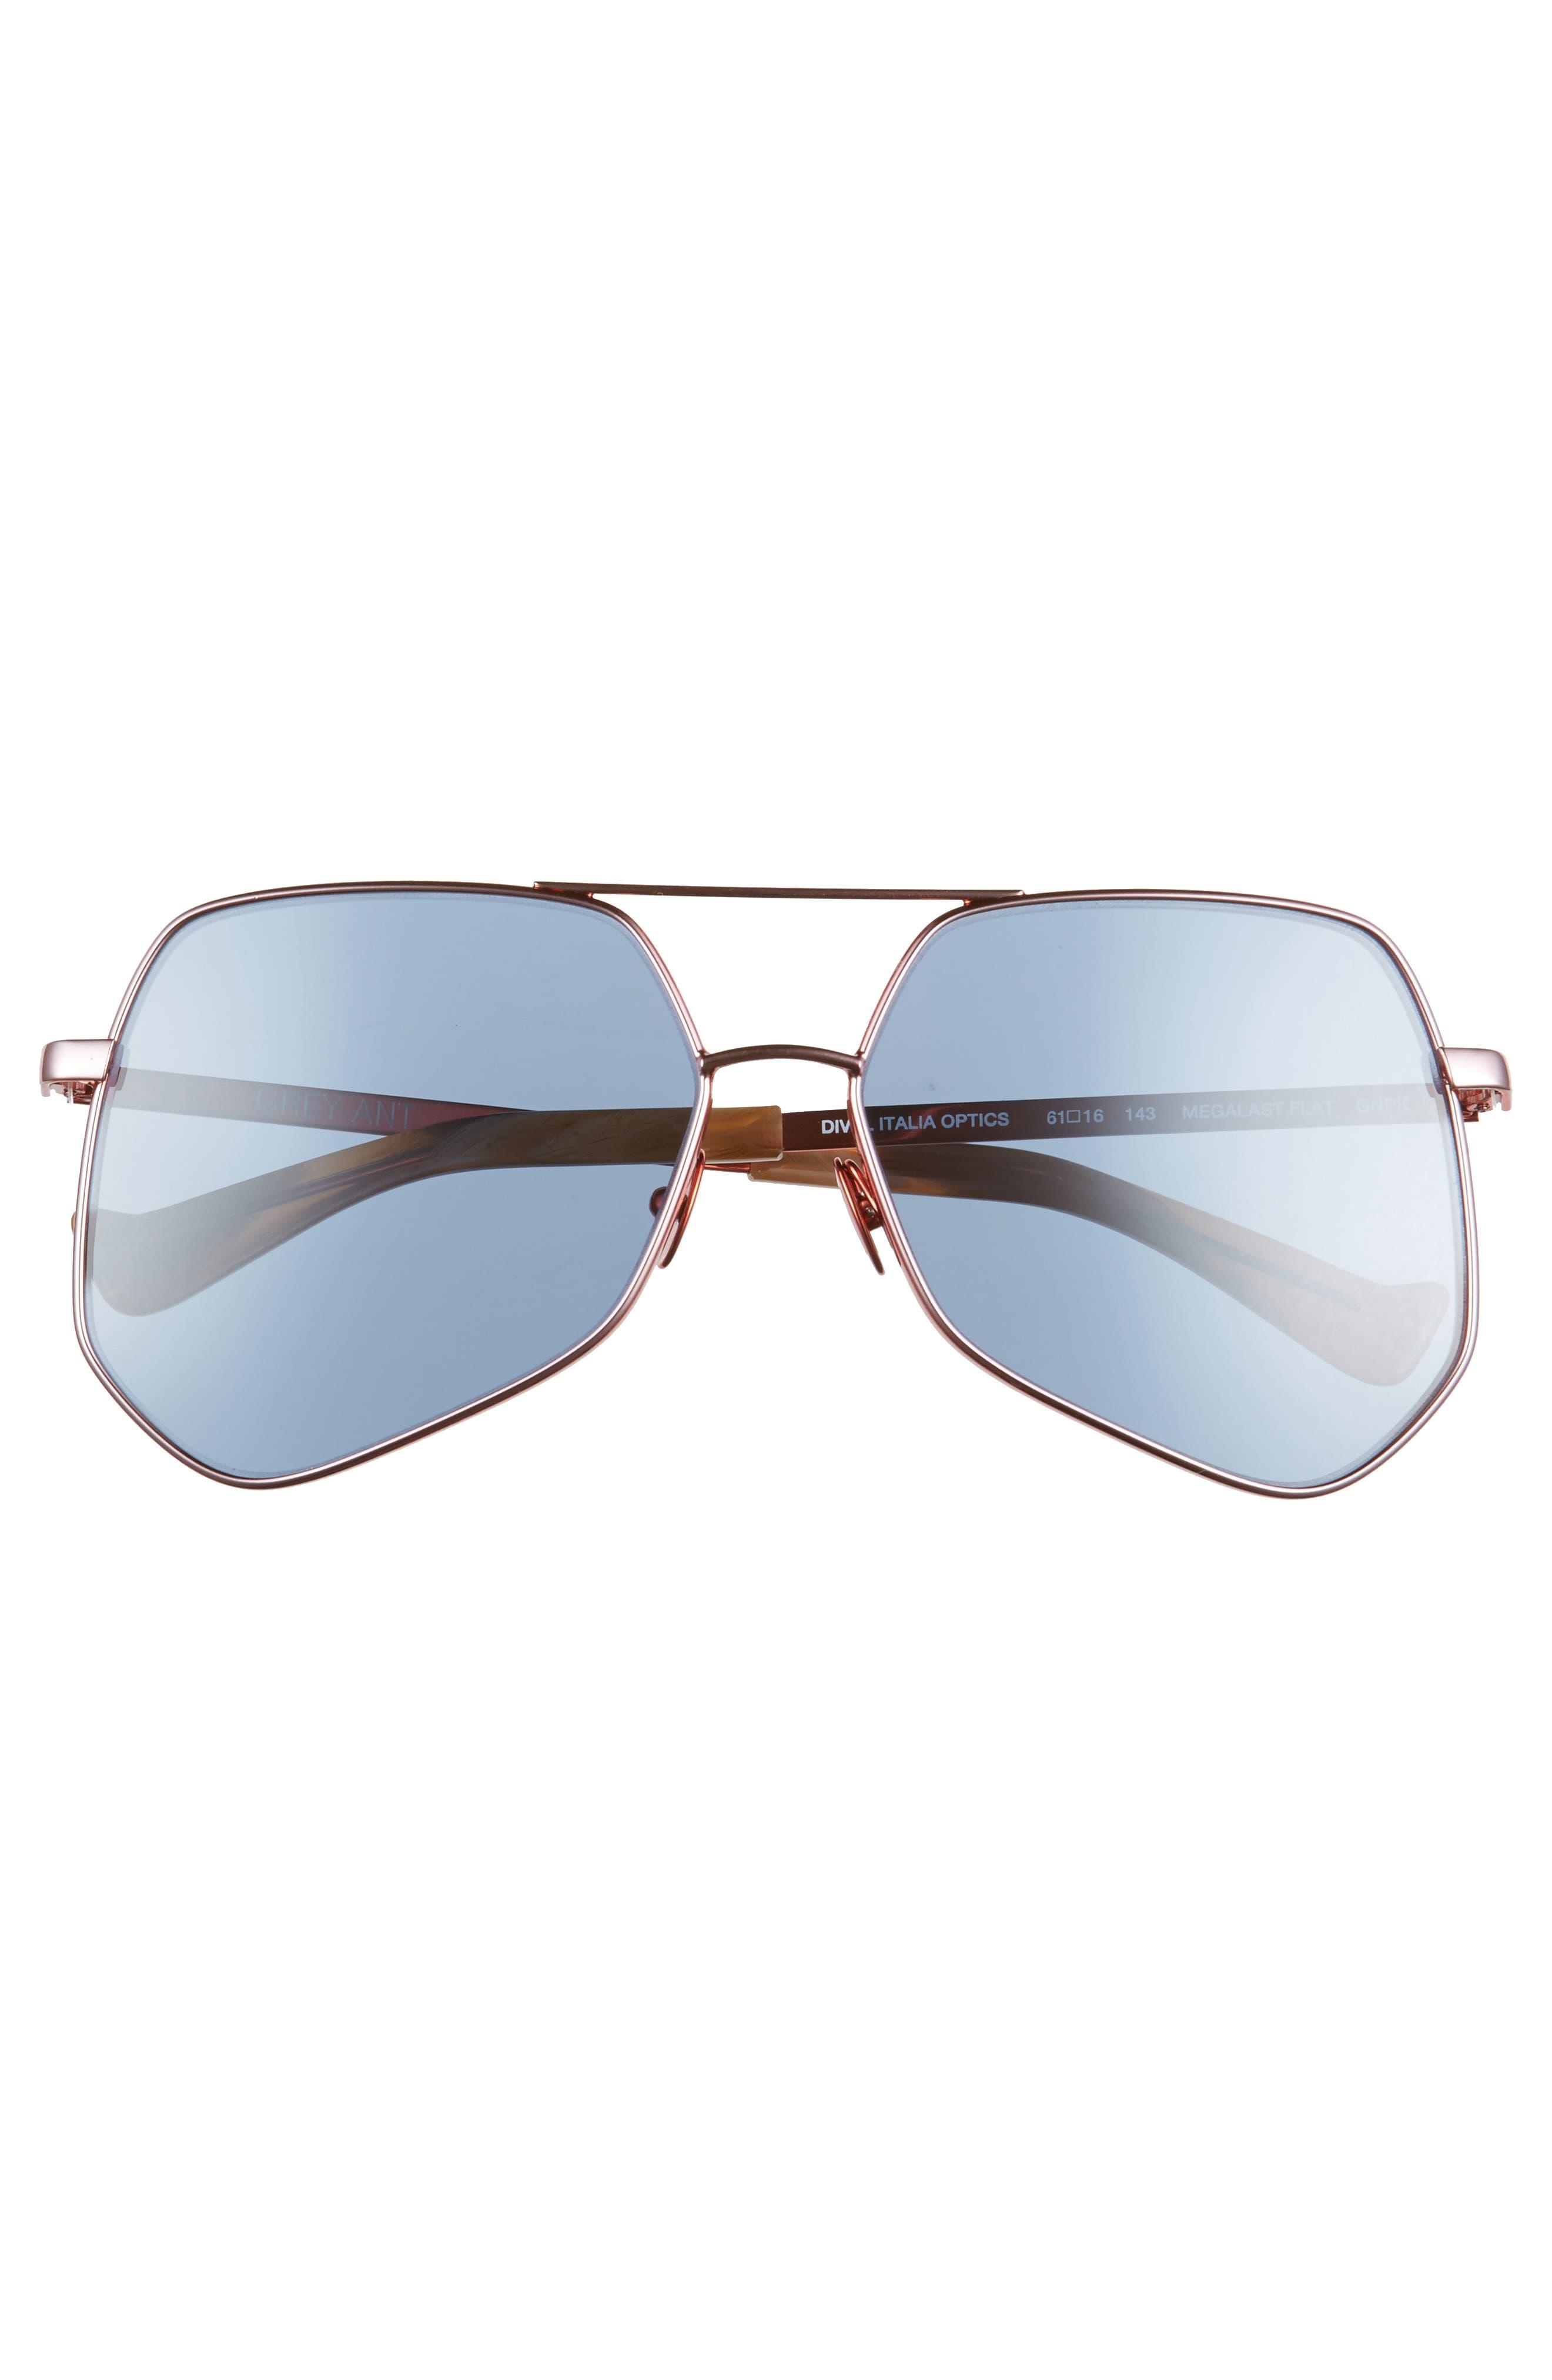 Megalast Flat 61mm Sunglasses,                             Alternate thumbnail 3, color,                             Copper Pink / Light Blue